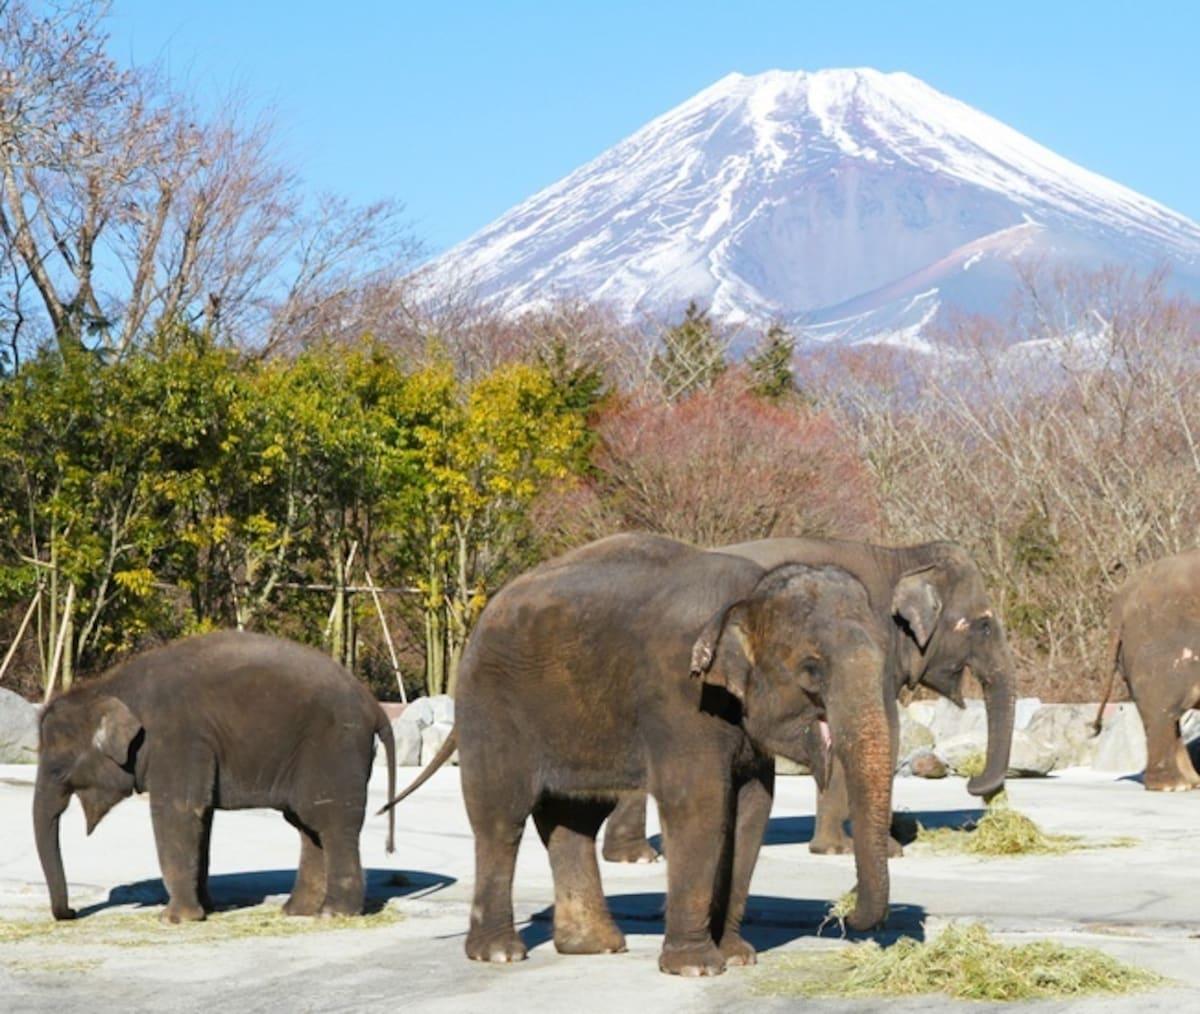 5. Go to a Zoo, Aquarium or Safari Park